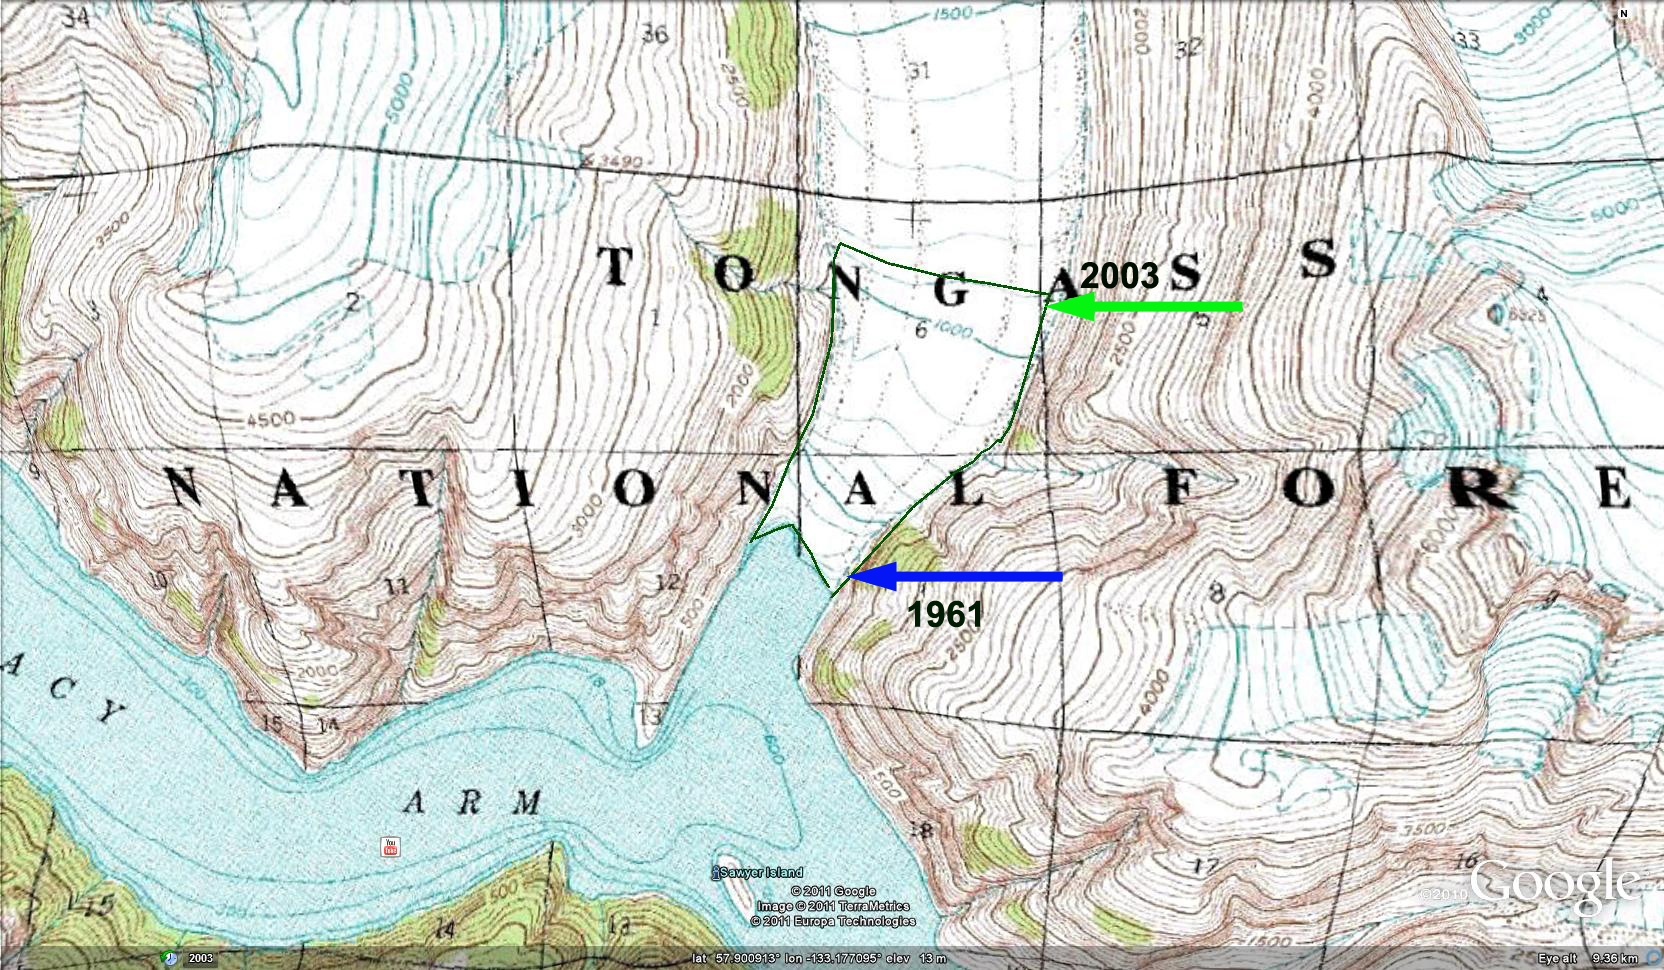 Saywer Glacier, Alaska Retreat - From a Glacier's Perspective - AGU on